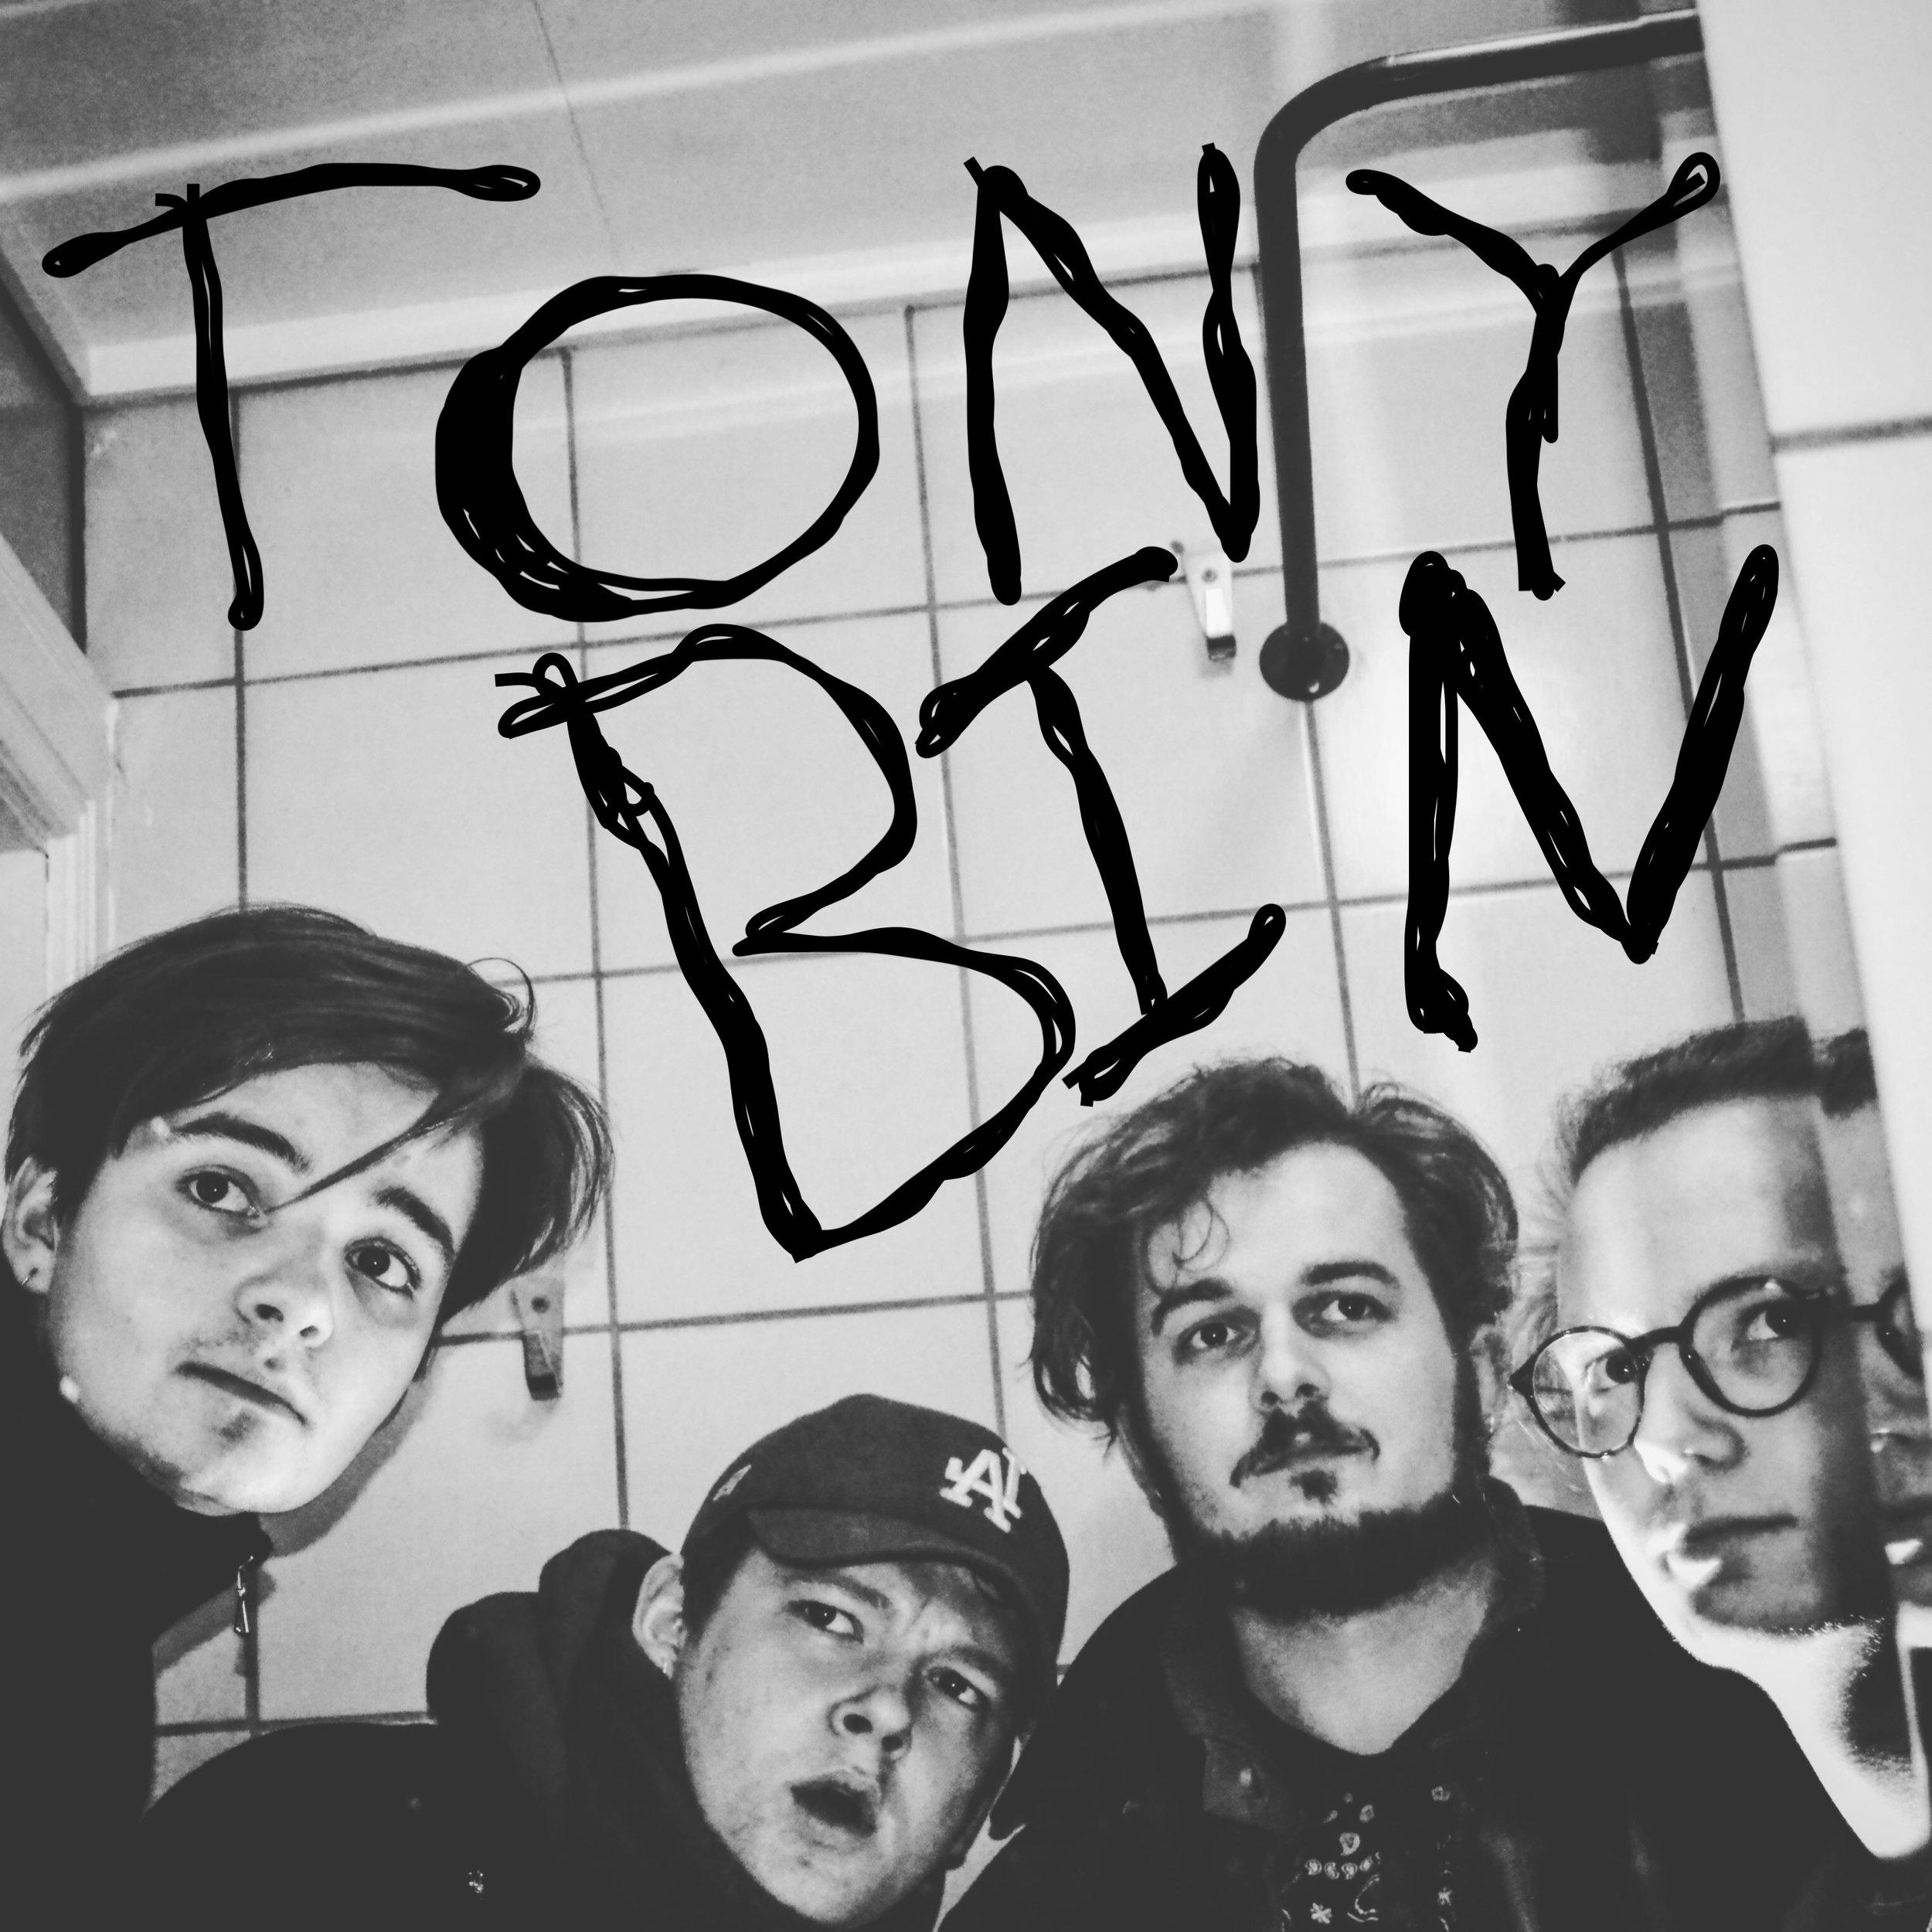 Tony Bin - TIME: 16:00STAGE: BLACK ROOMVIEW PROGRAM